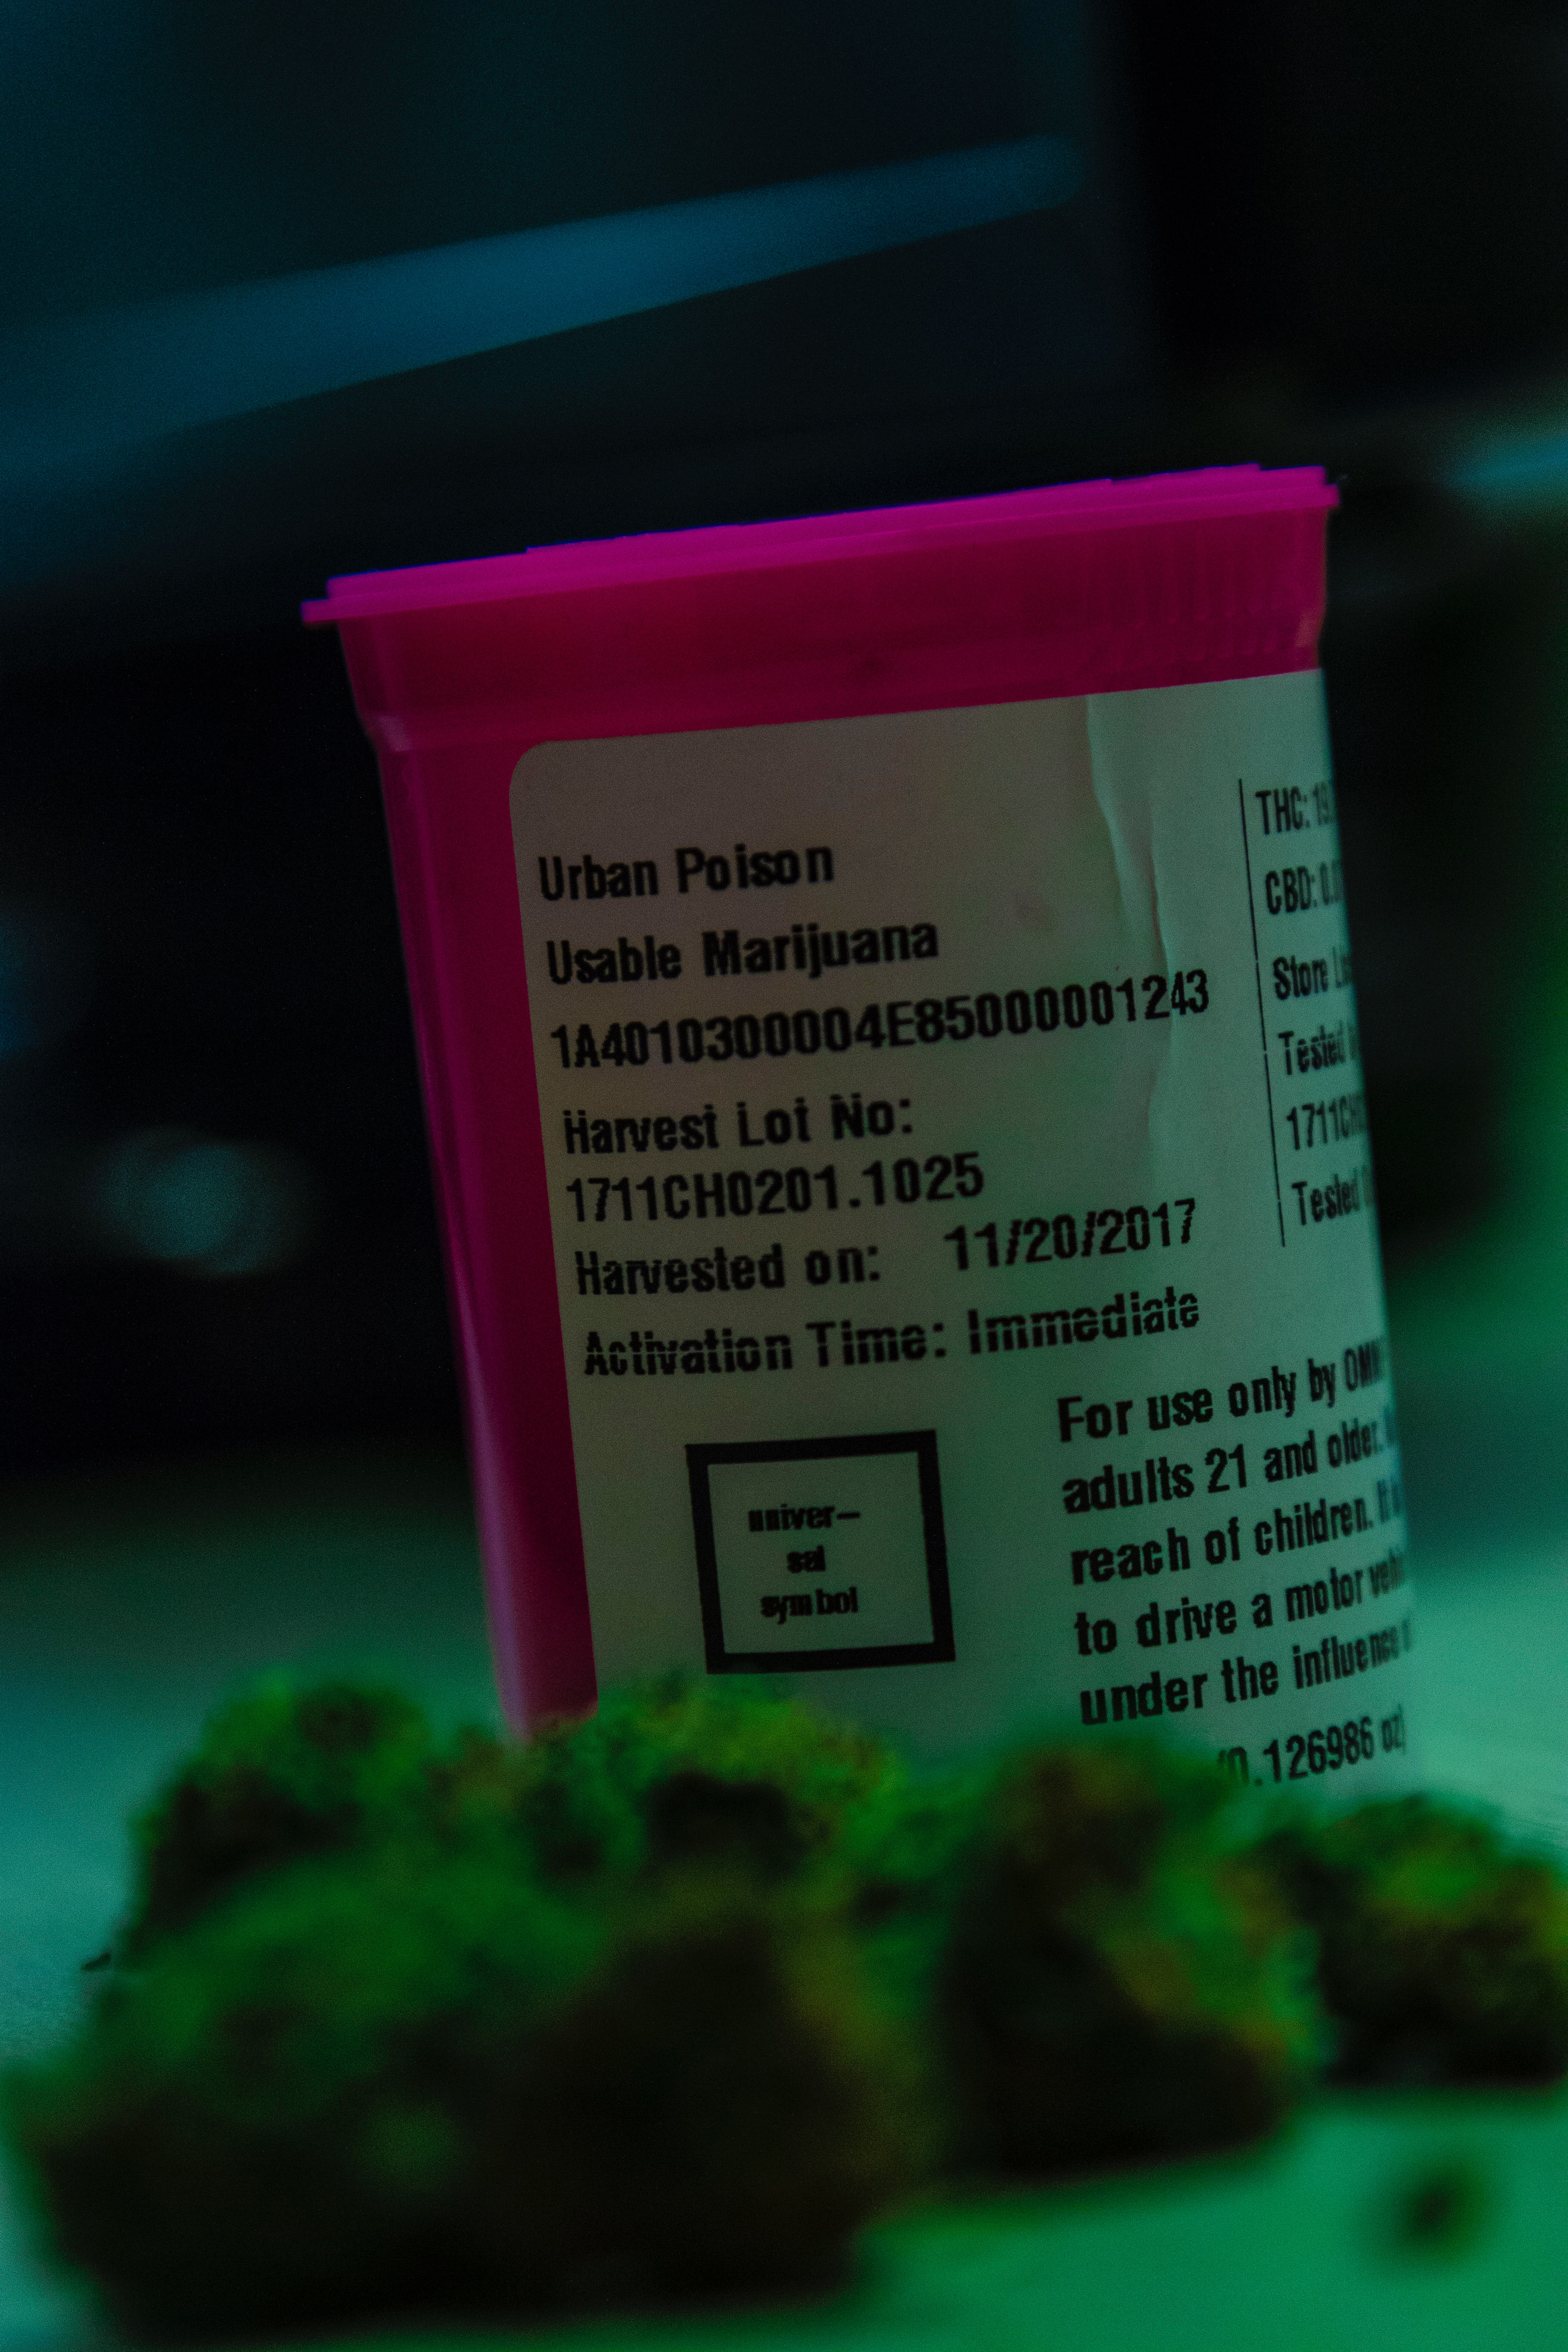 Medial Marijuana Solutions image 2